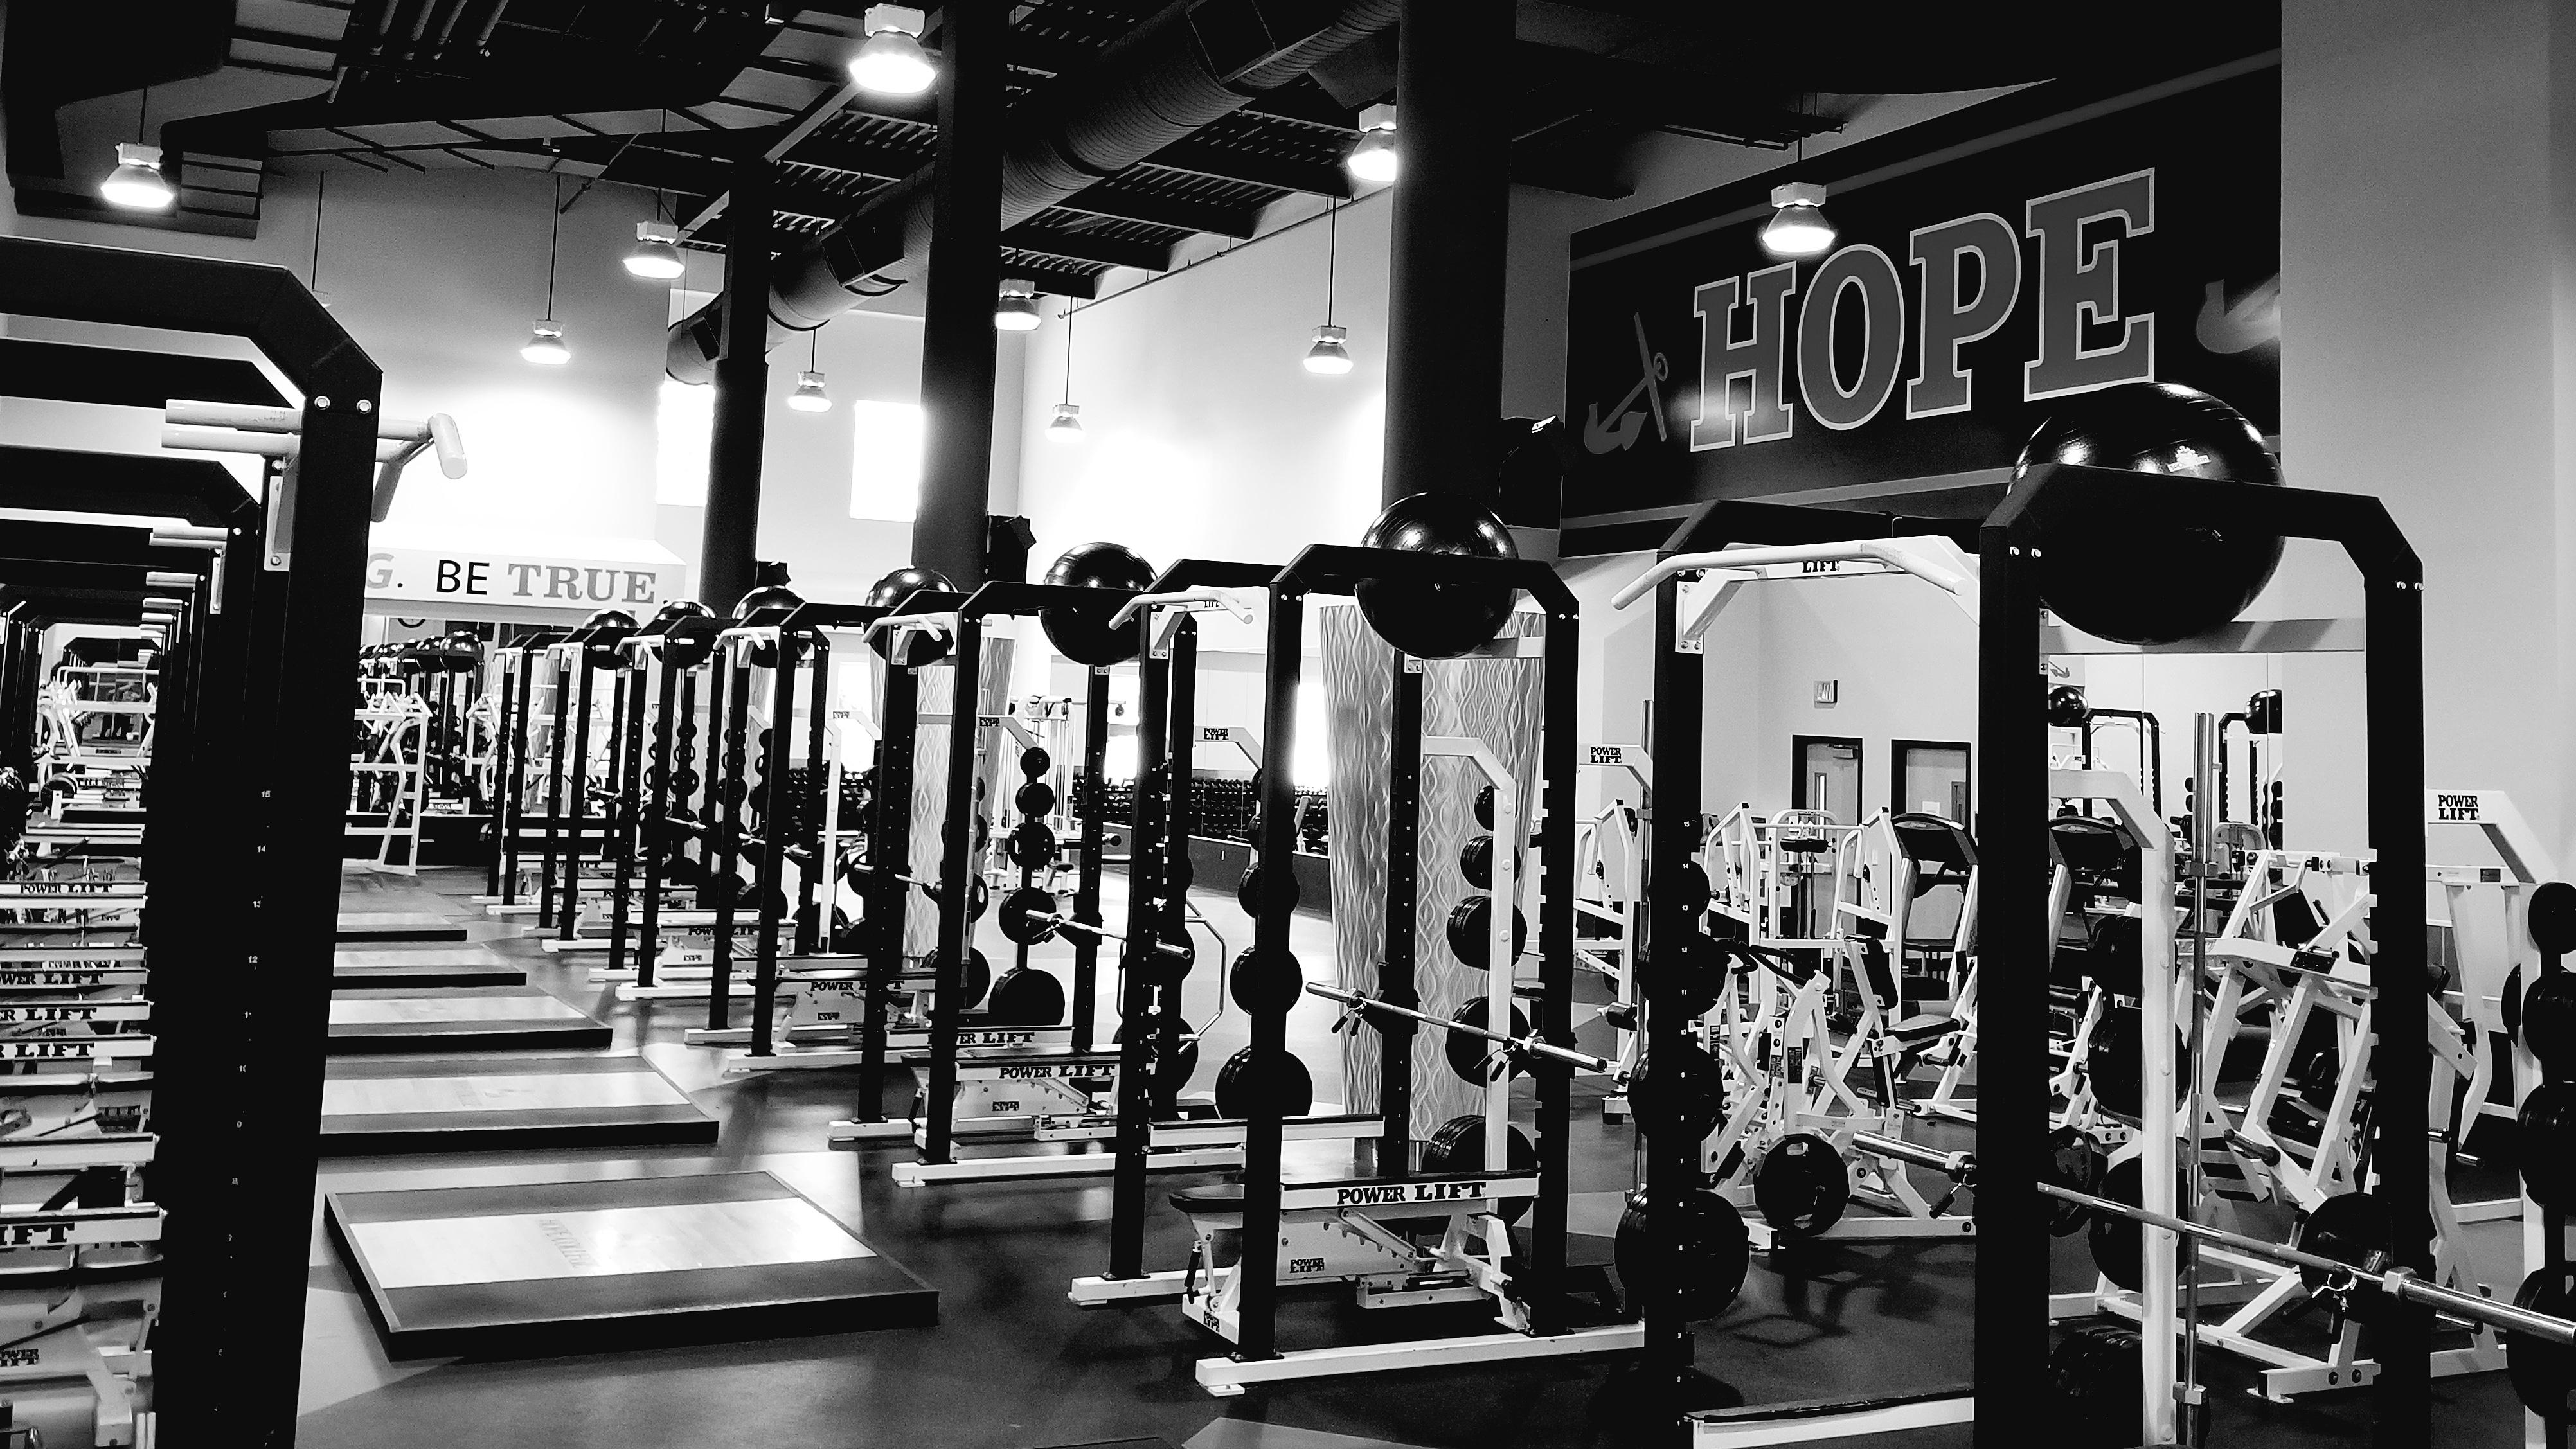 hope college weight room.jpeg